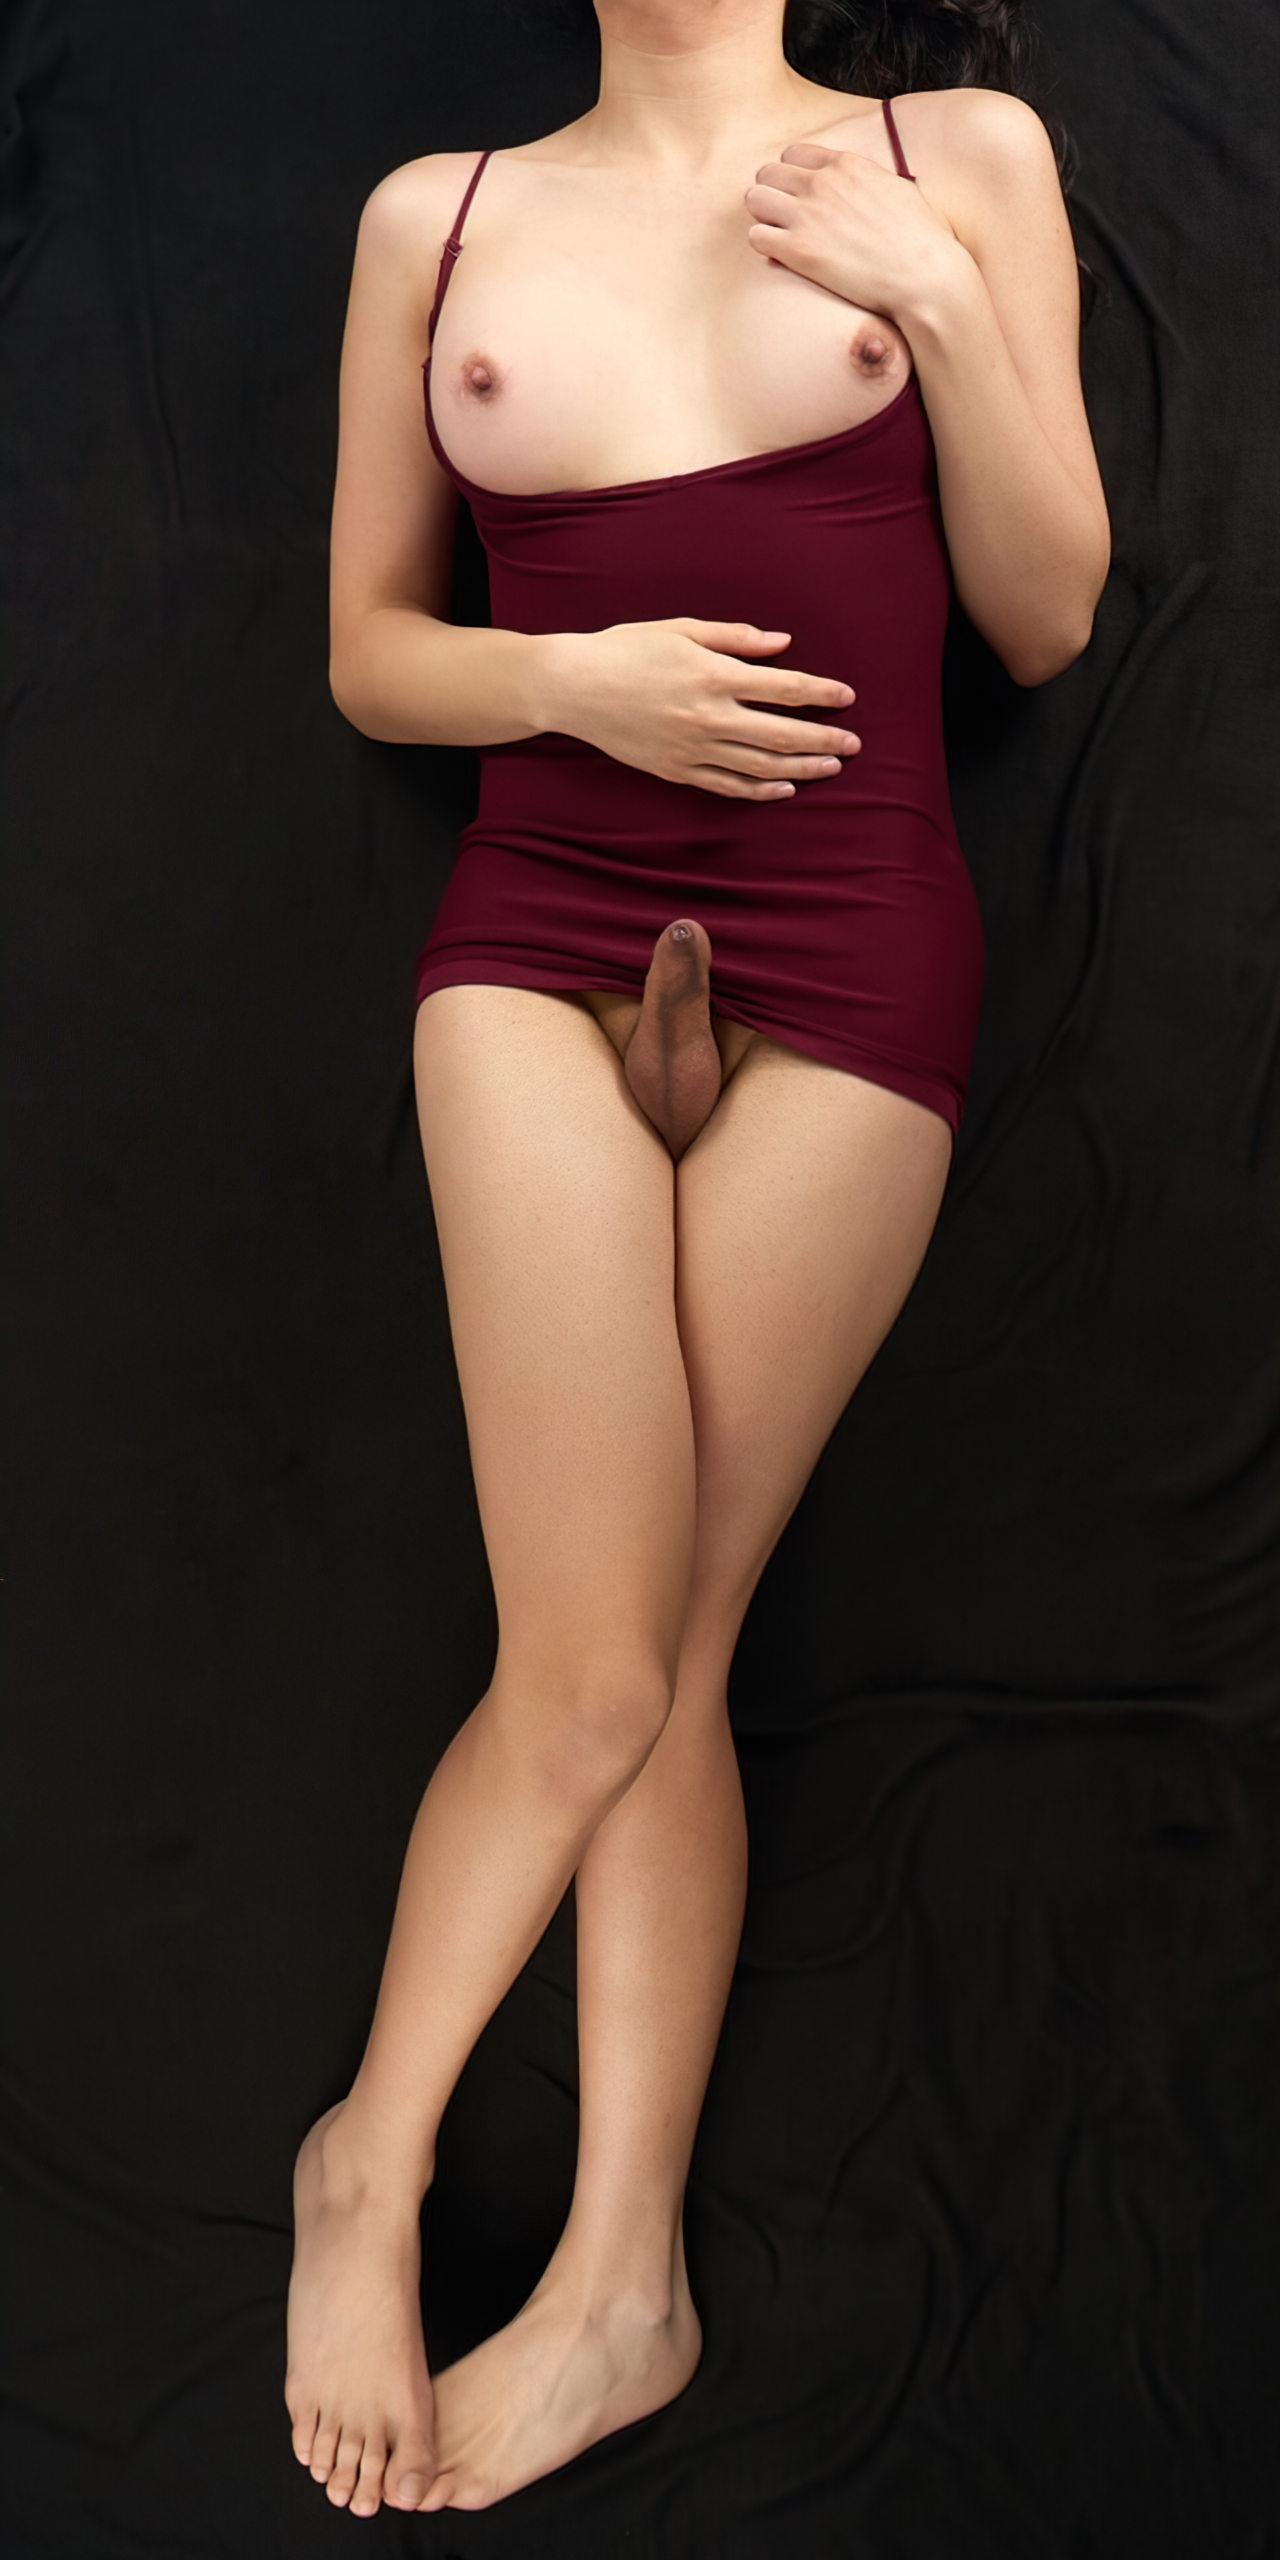 Nudes Trans Peituda (4)